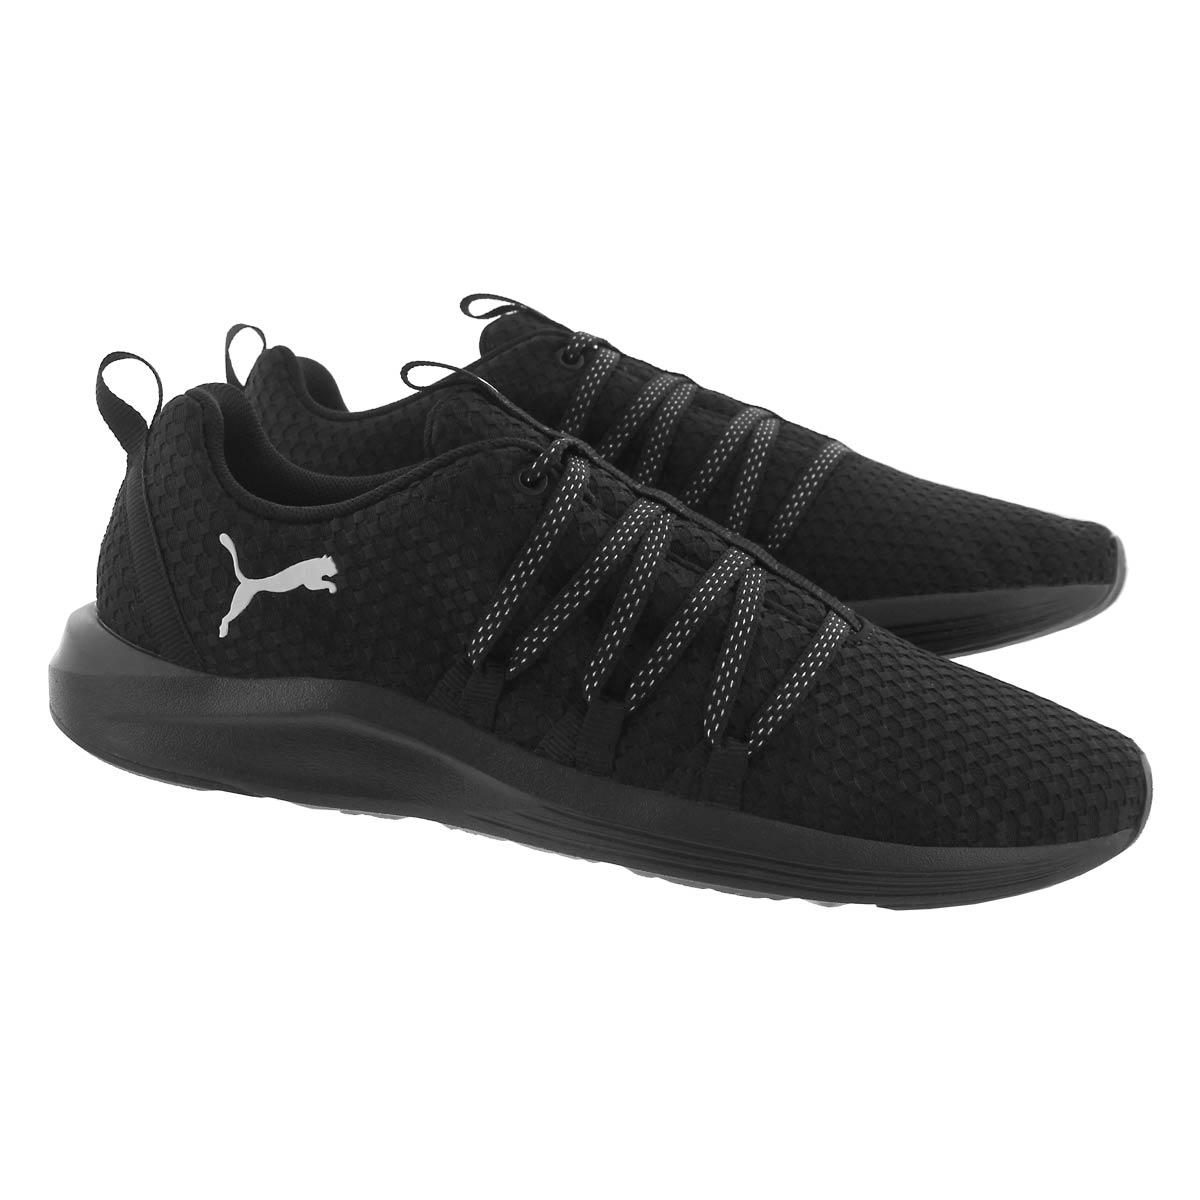 Lds Prowl Alt Weave blk slip on sneaker